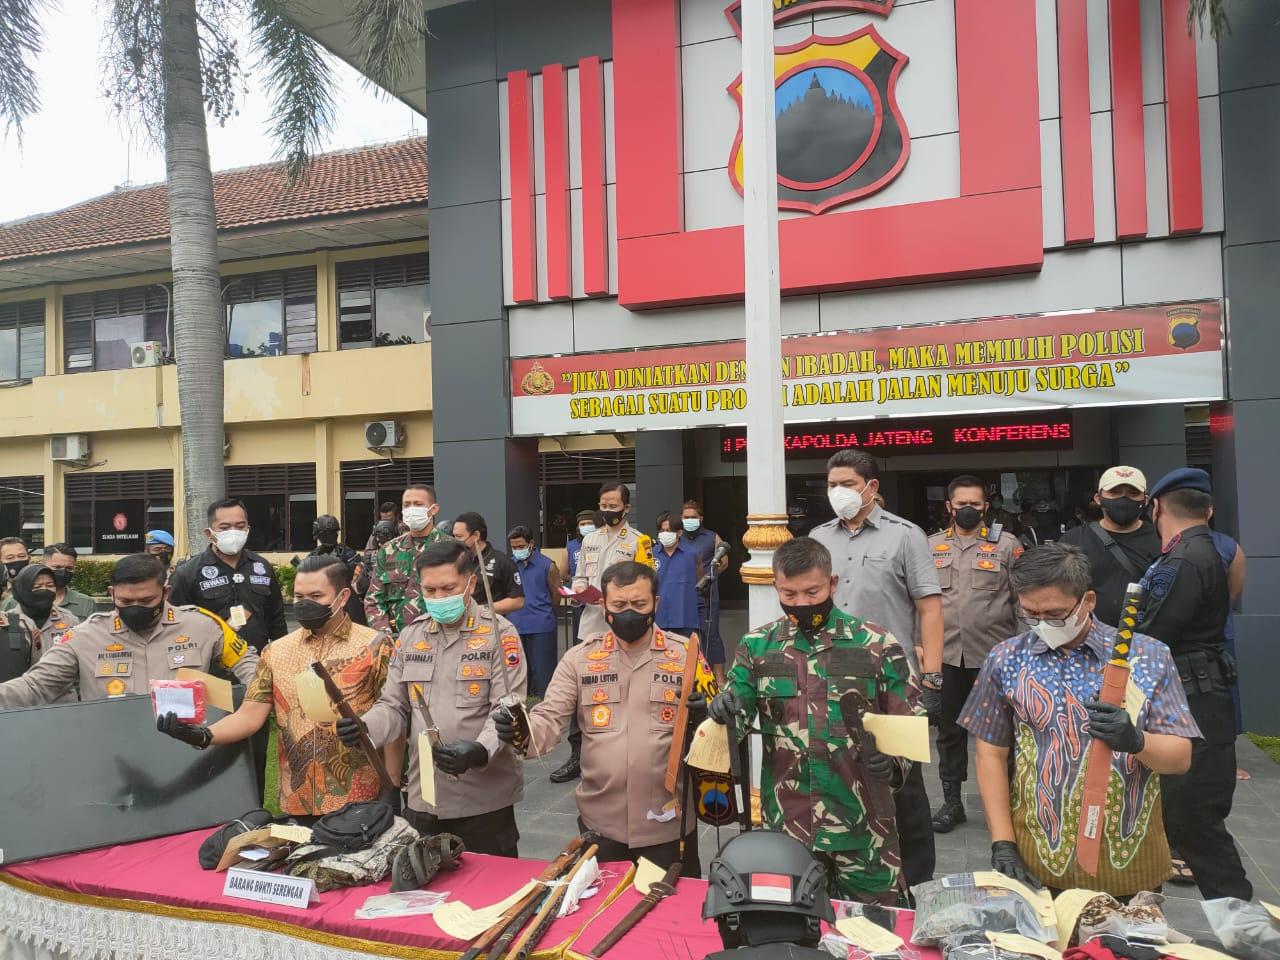 Kapolda Jateng Gunakan IT Lacak Para DPO, Aksi Premanisme Di Surakarta